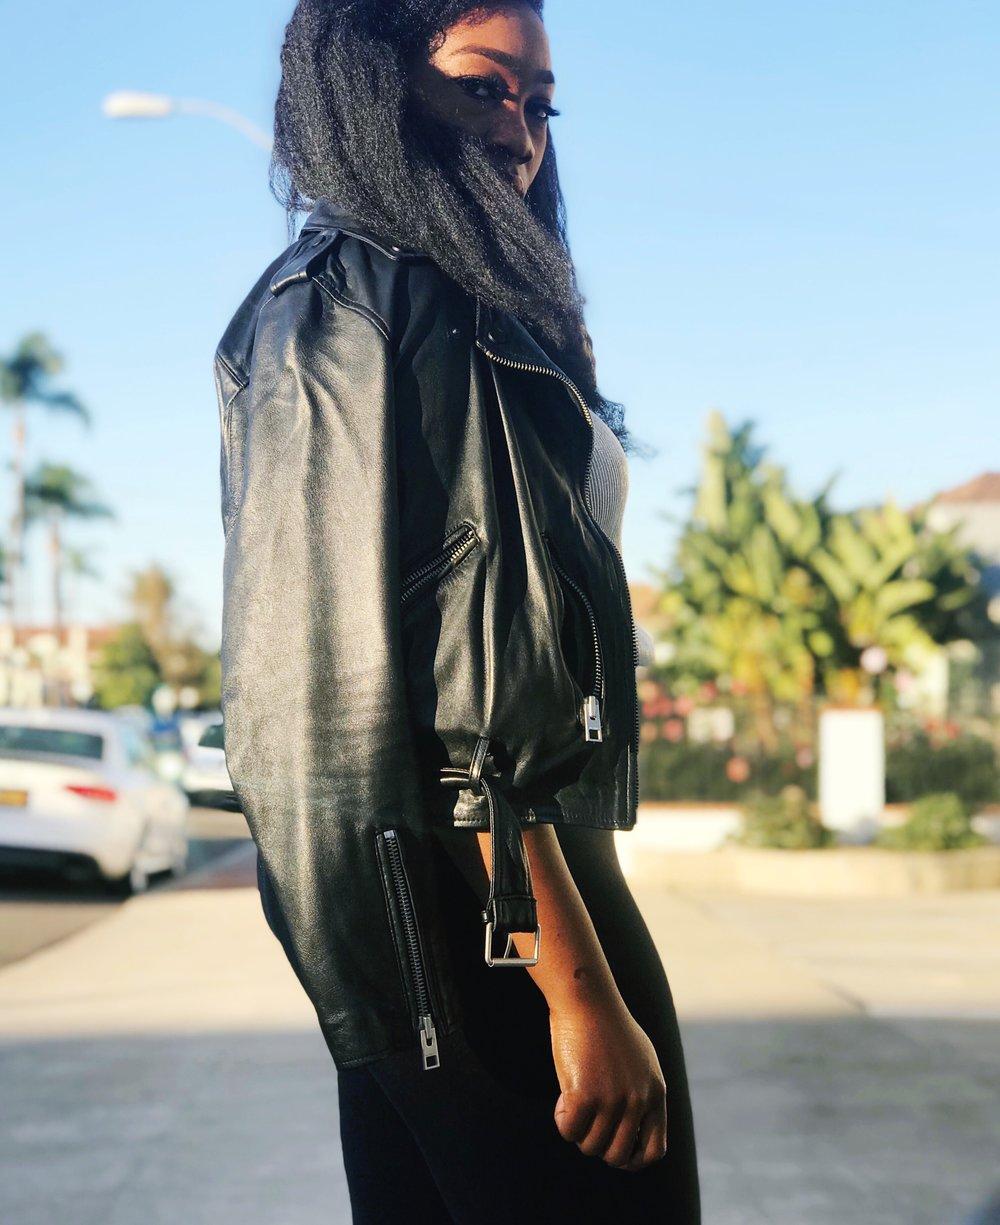 Femi in black leather jacket, black leggings, black strappy heels, silver tank.